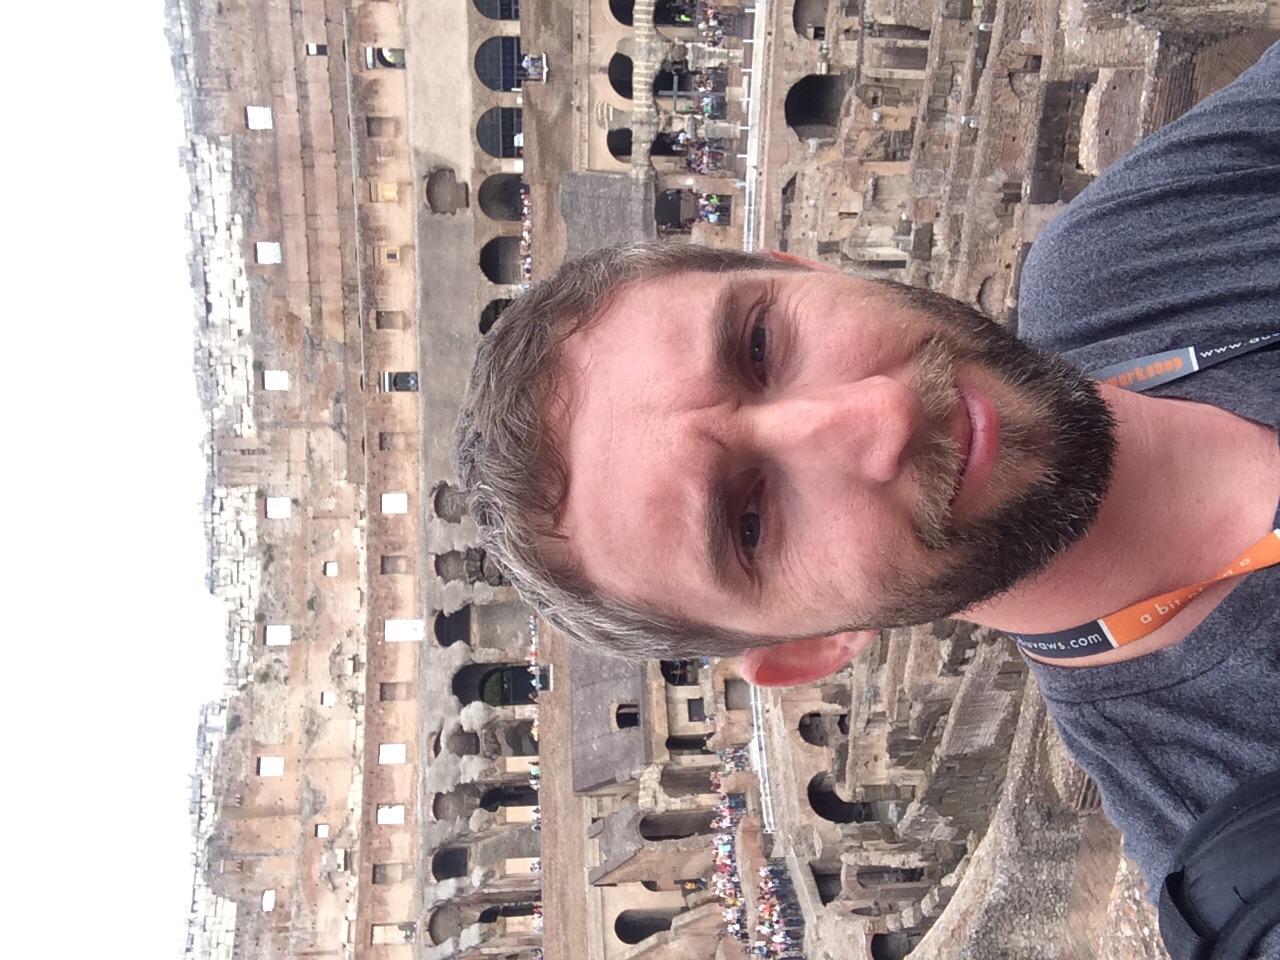 Colosseo, Holiday Beard.